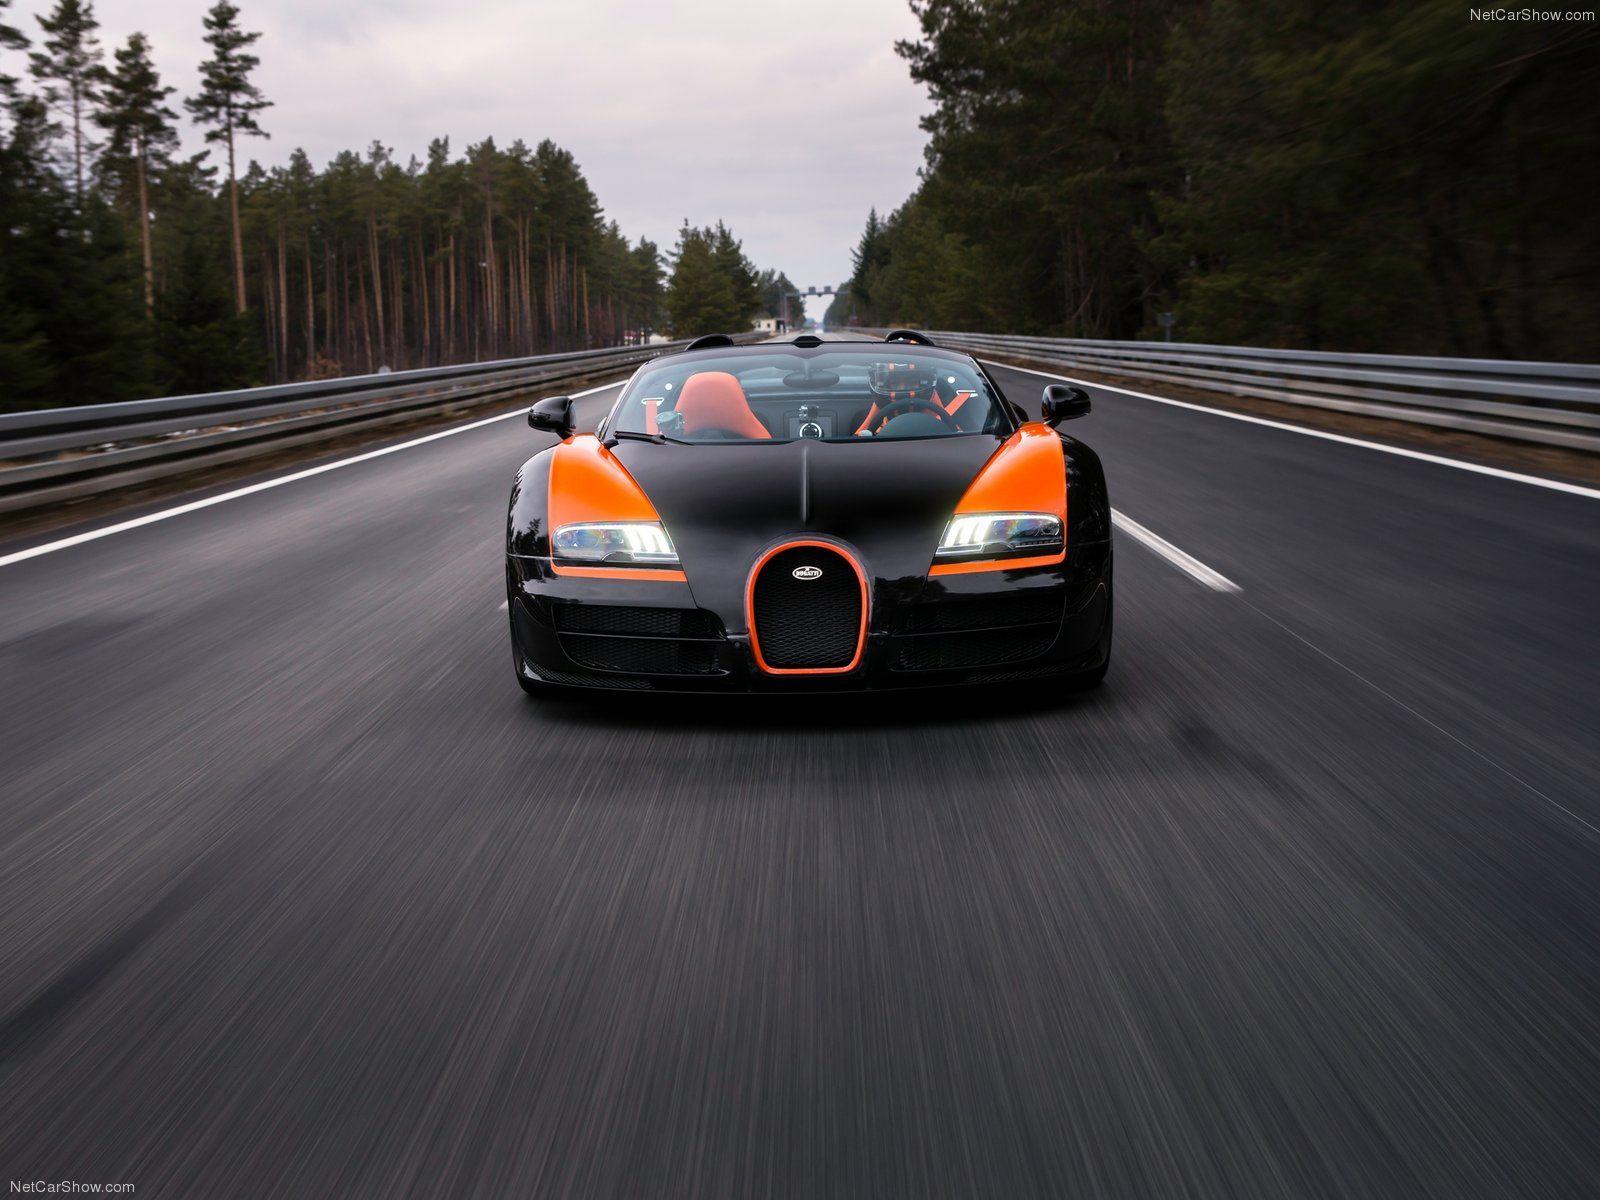 246d3e2864cb494cb1a86dd99def5981 Terrific Bugatti Veyron 16.4 Grand Sport Vitesse Prix Cars Trend